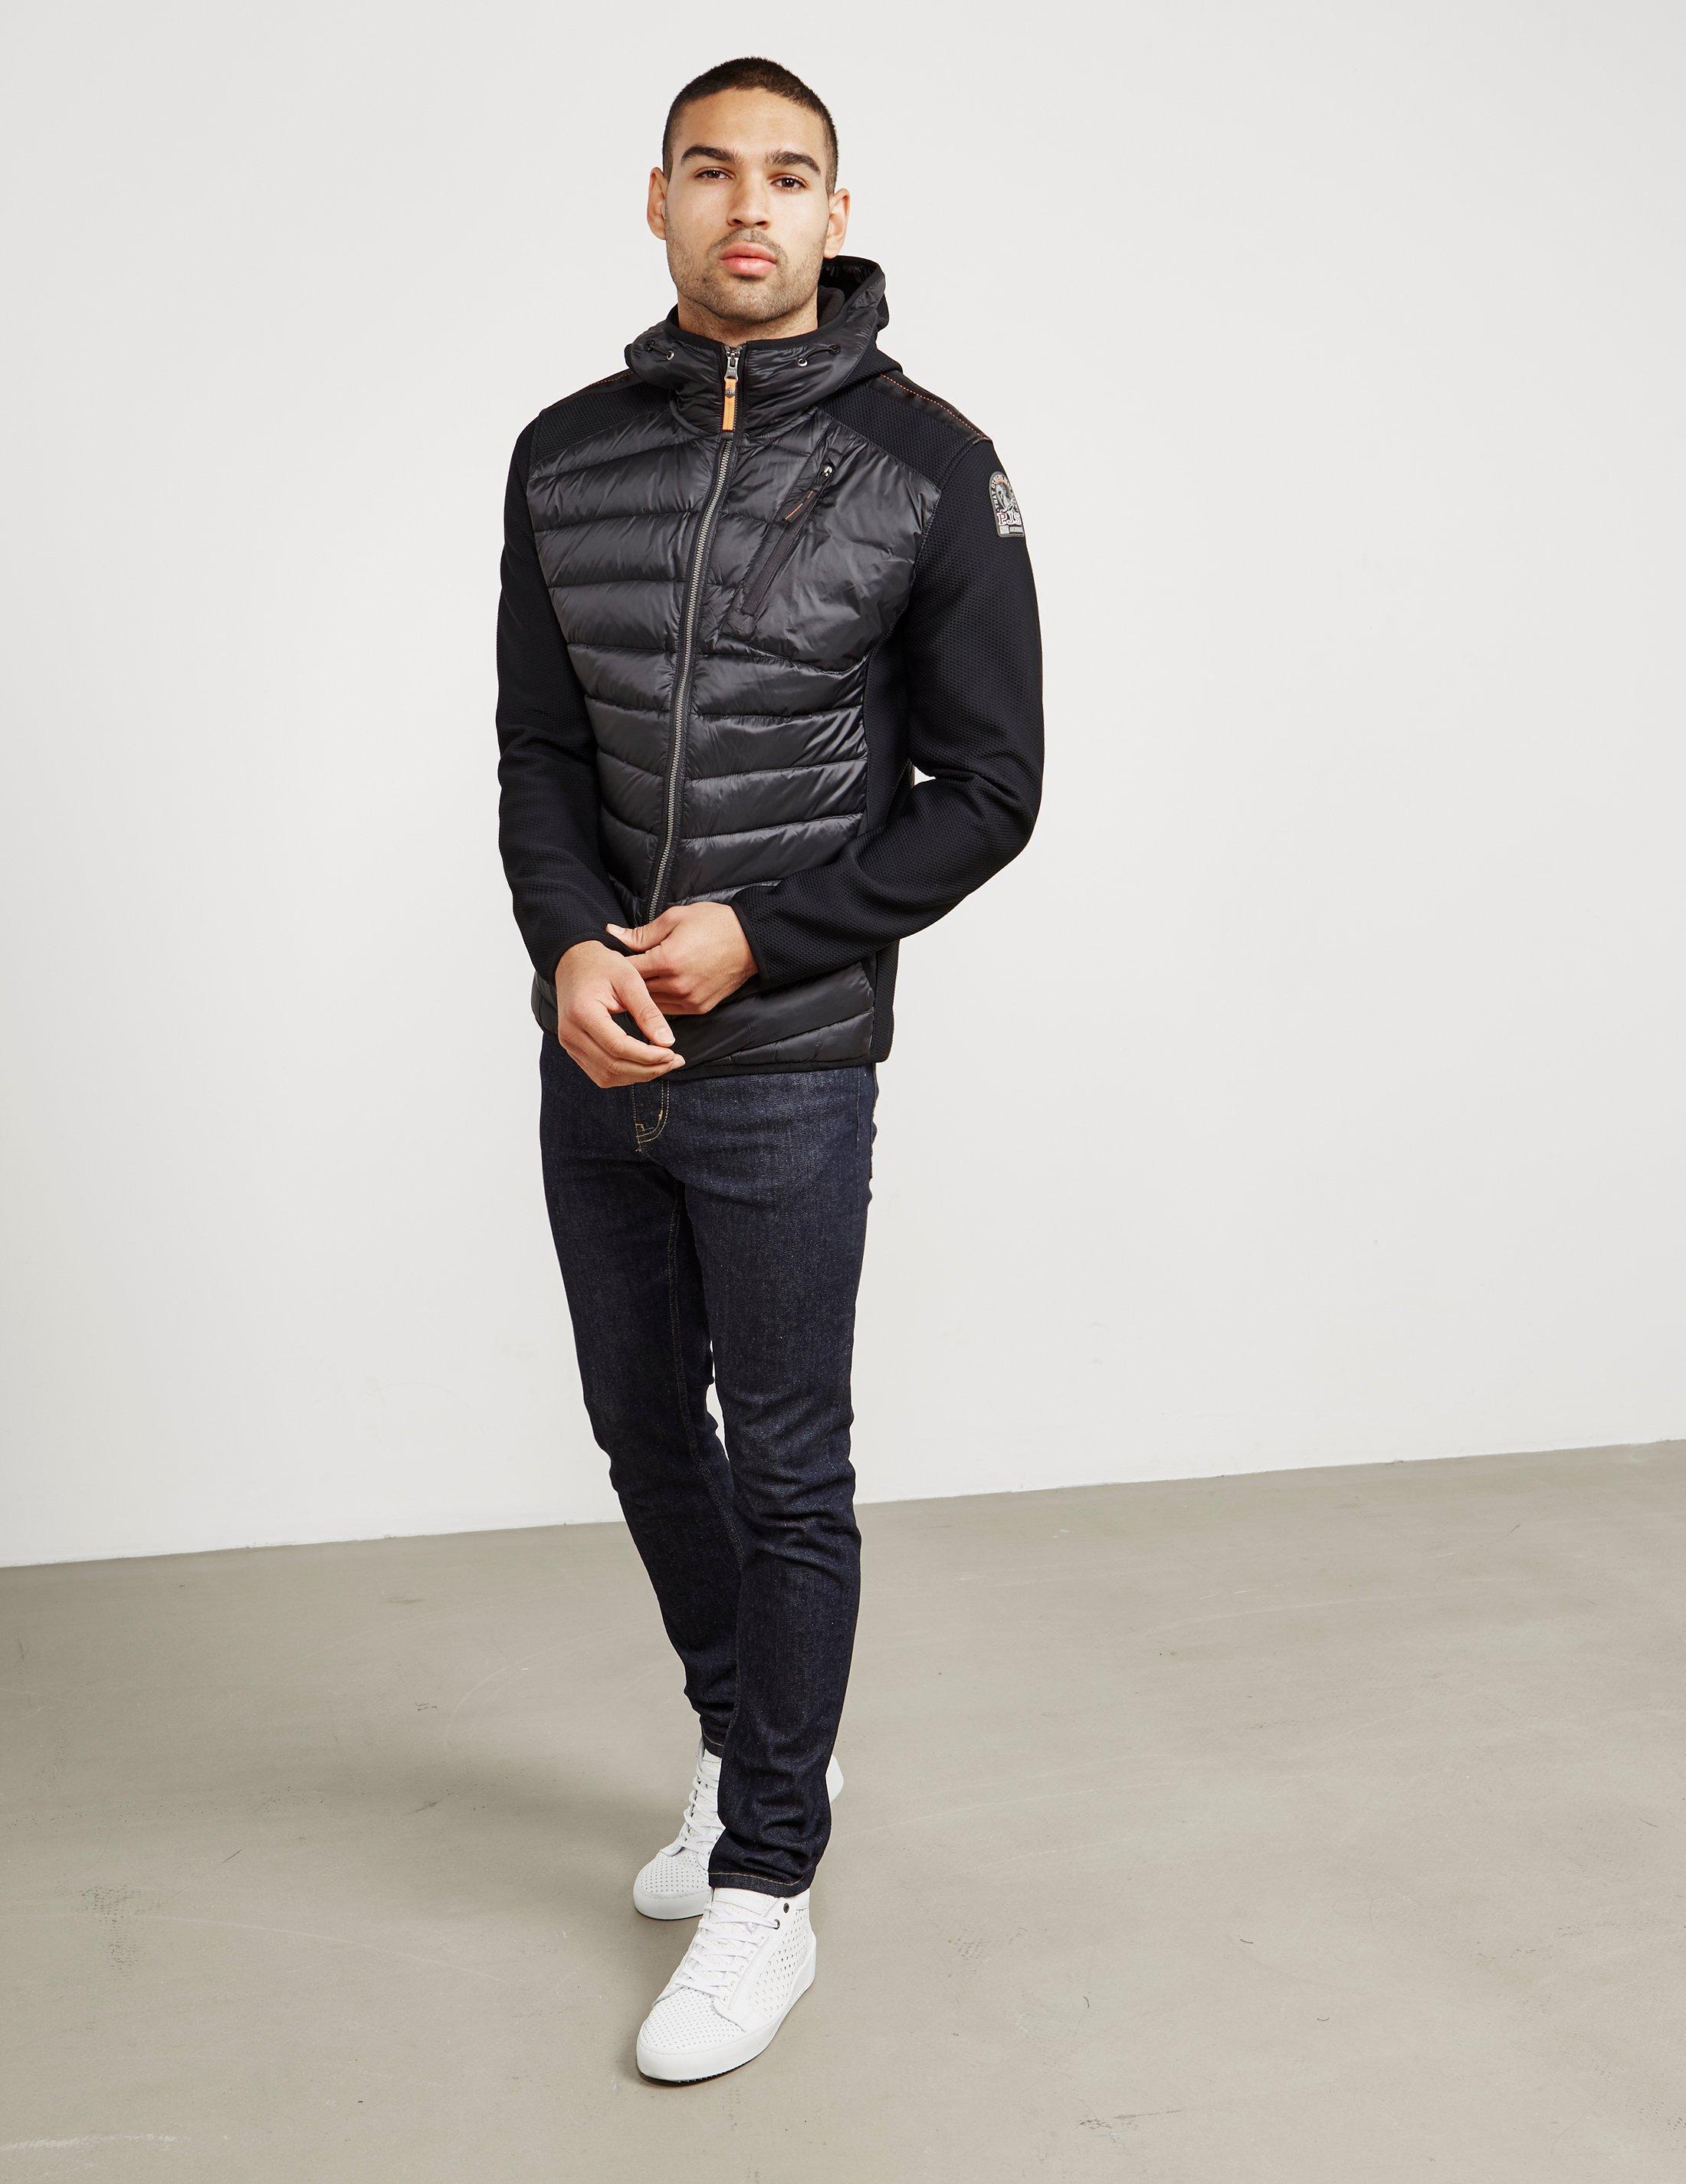 Lyst - Parajumpers Mens Nolan Lightweight Hooded Jacket Black in Black for Men - Save 5.962059620596207%